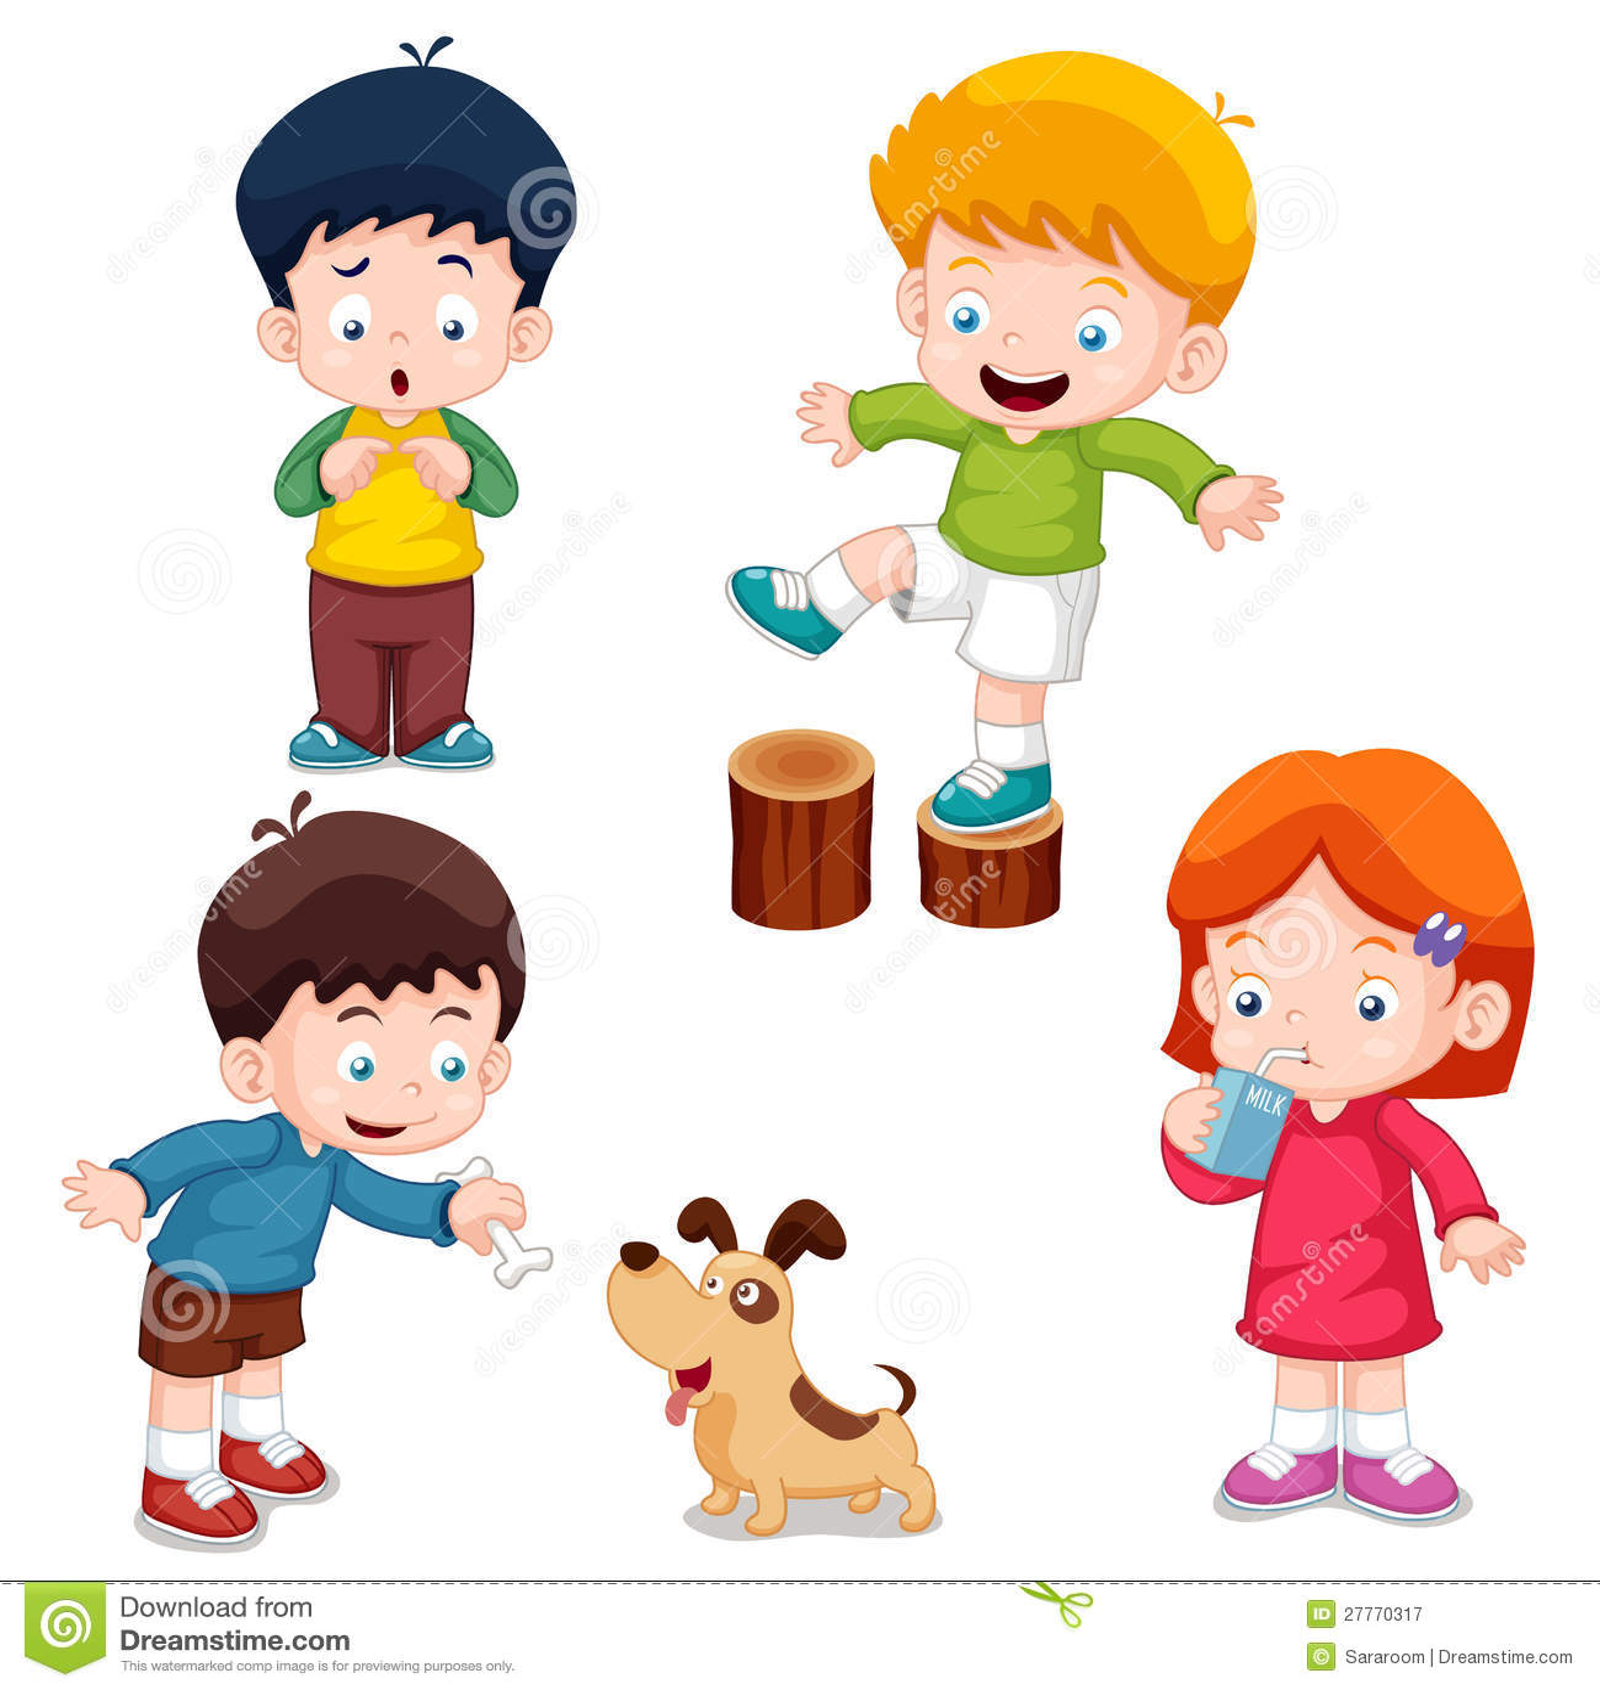 Cartoon Characters For Kids : Kids cartoon characters ankaperla